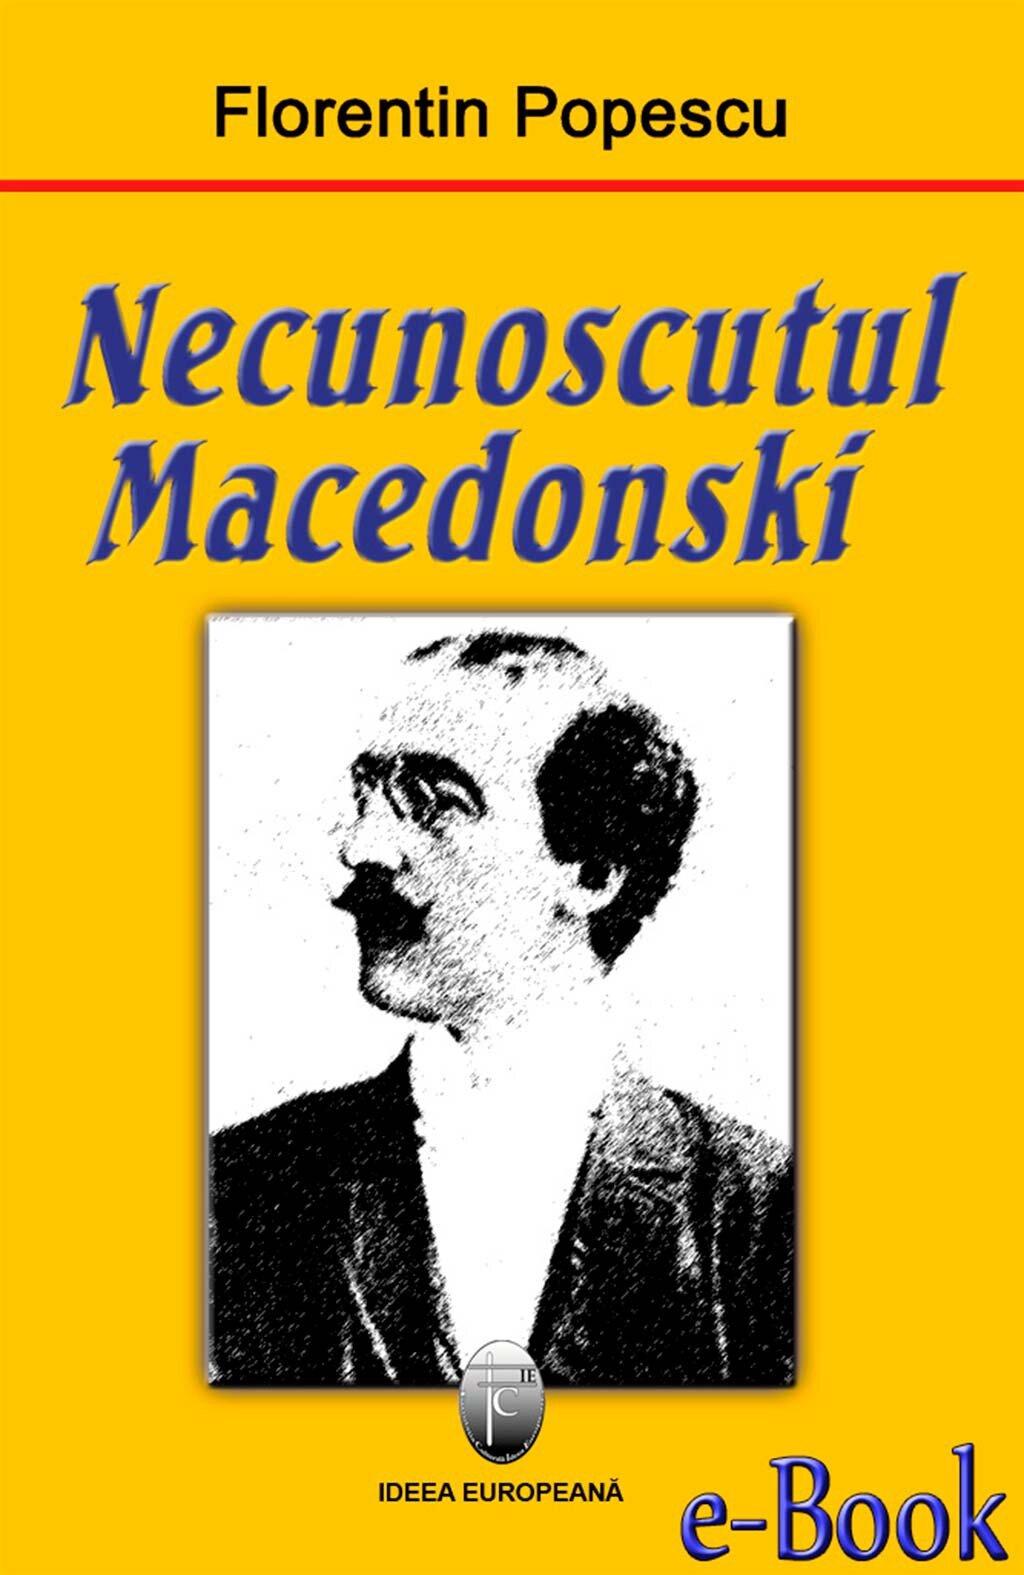 Necunoscutul Macedonski (eBook)